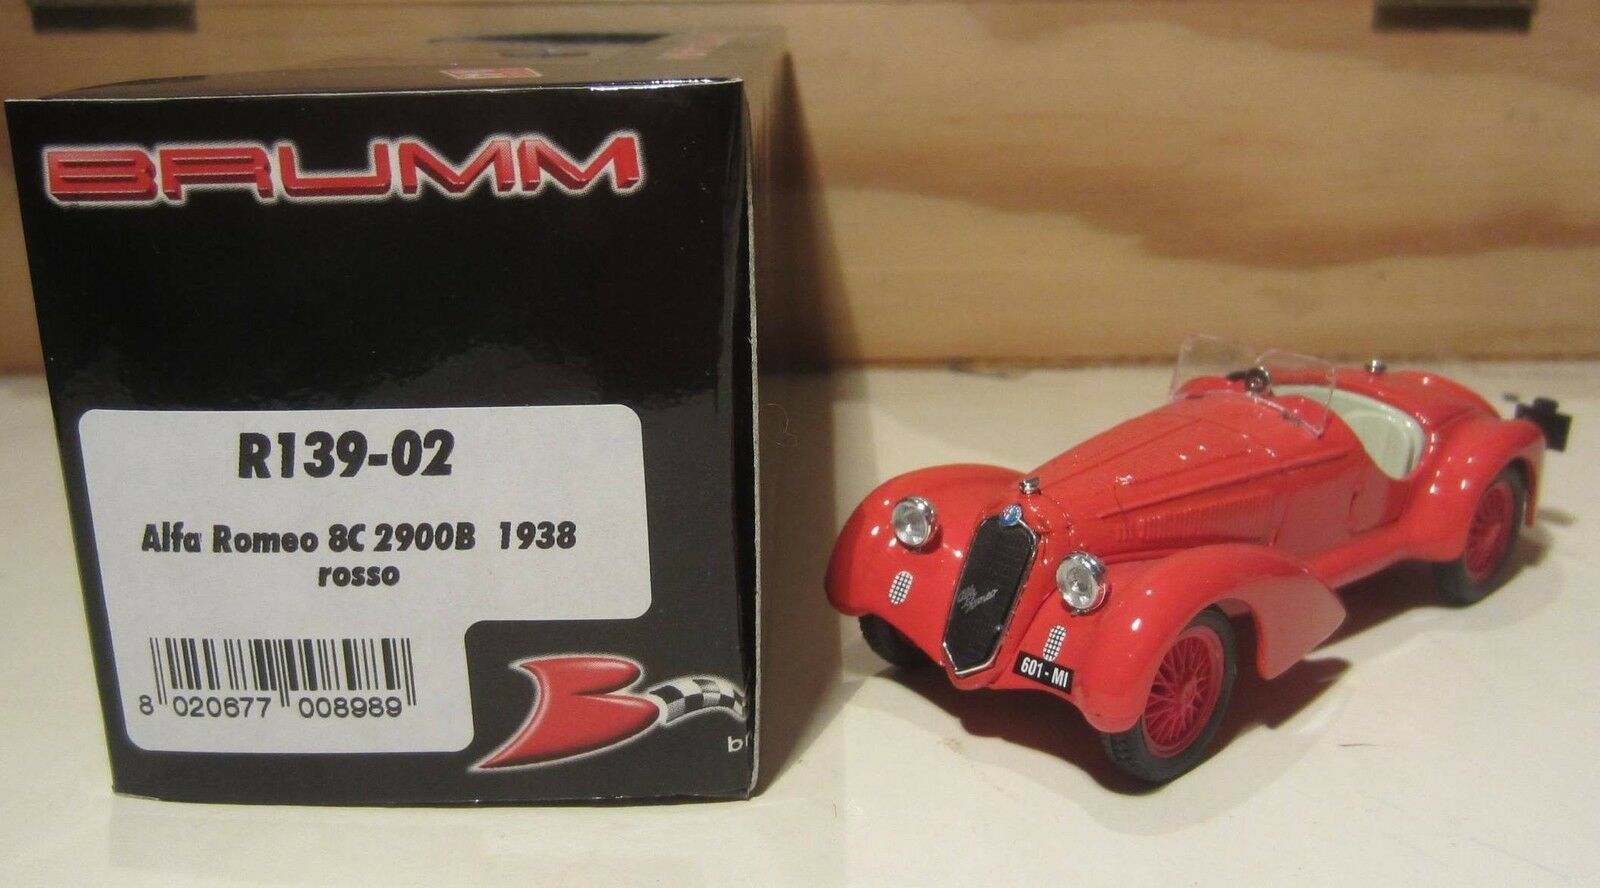 637. Brumm Brumm Brumm R139-01 02 03 04 Alfa Romeo 2900B MB Complete series 4 colours MB 916c82